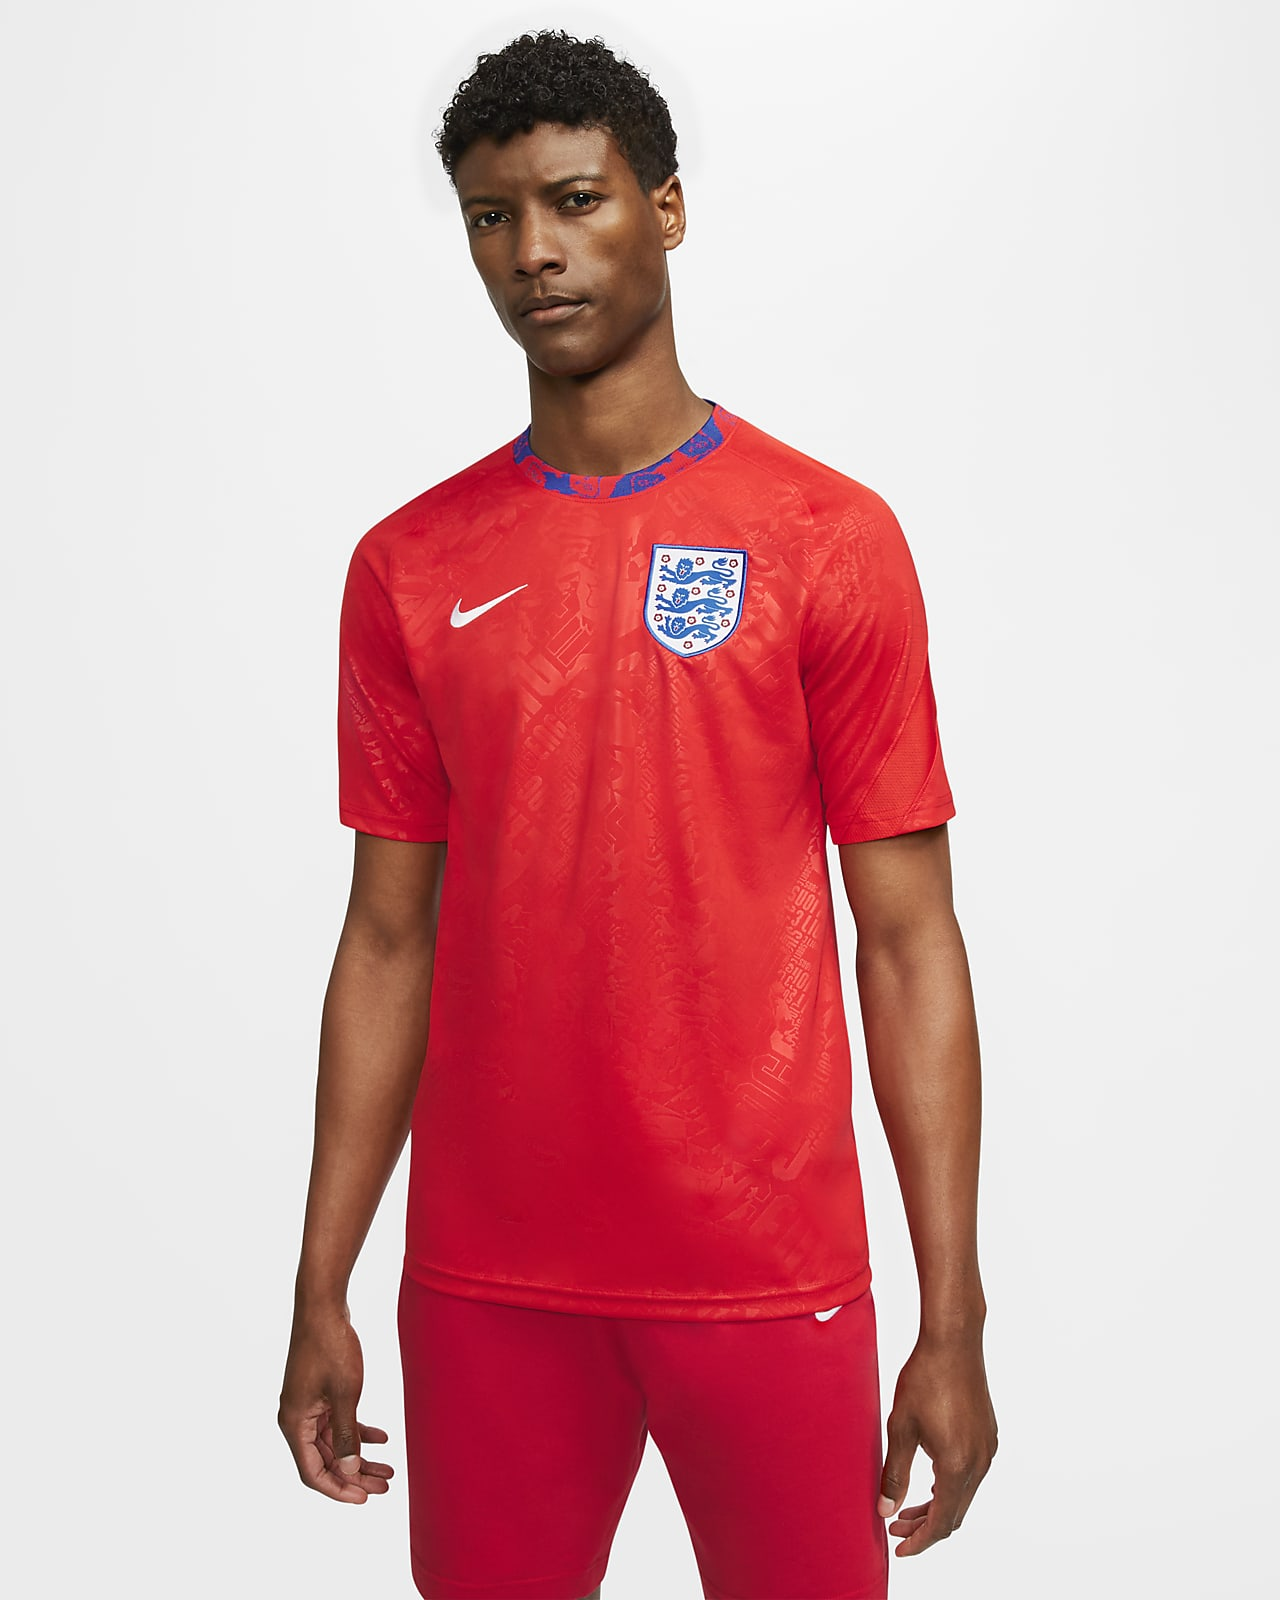 Anglia rövid ujjú férfi futballfelső